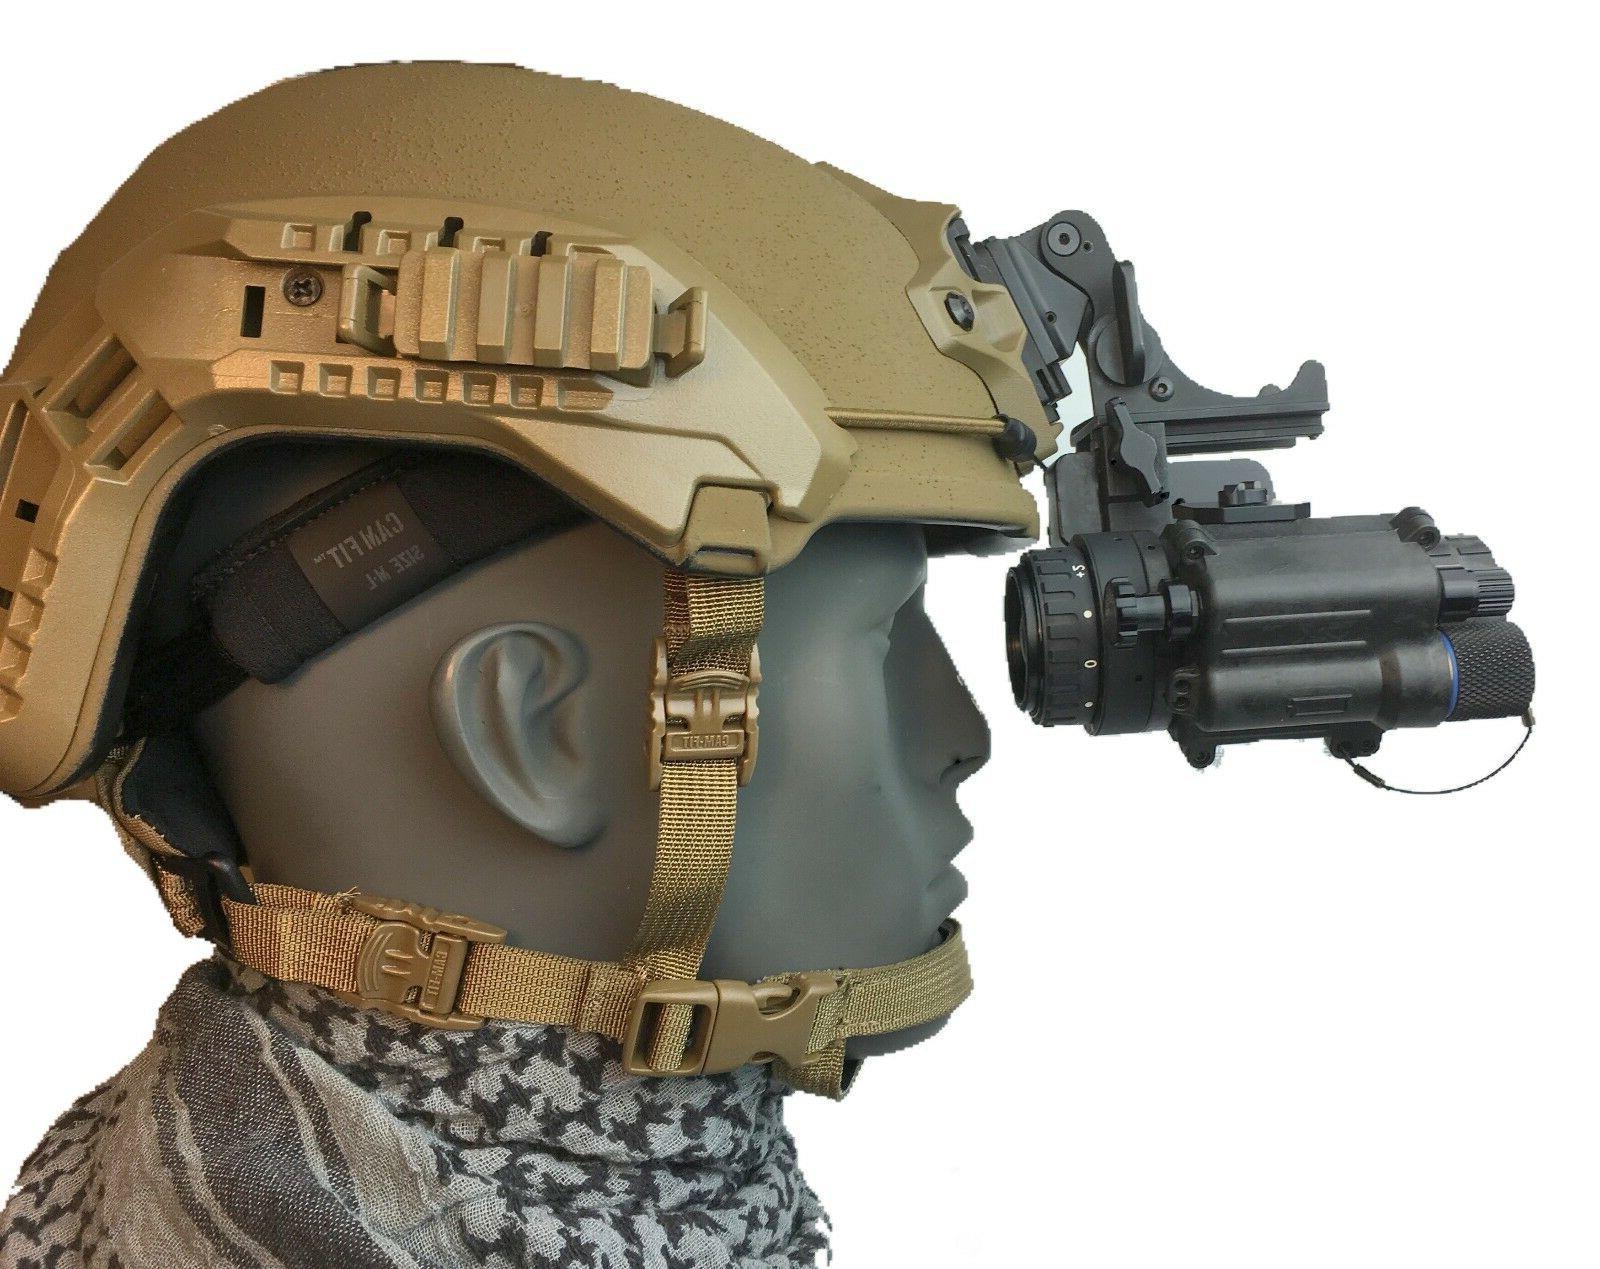 J AN/PVS-14 Monocular NVG or Bayonet